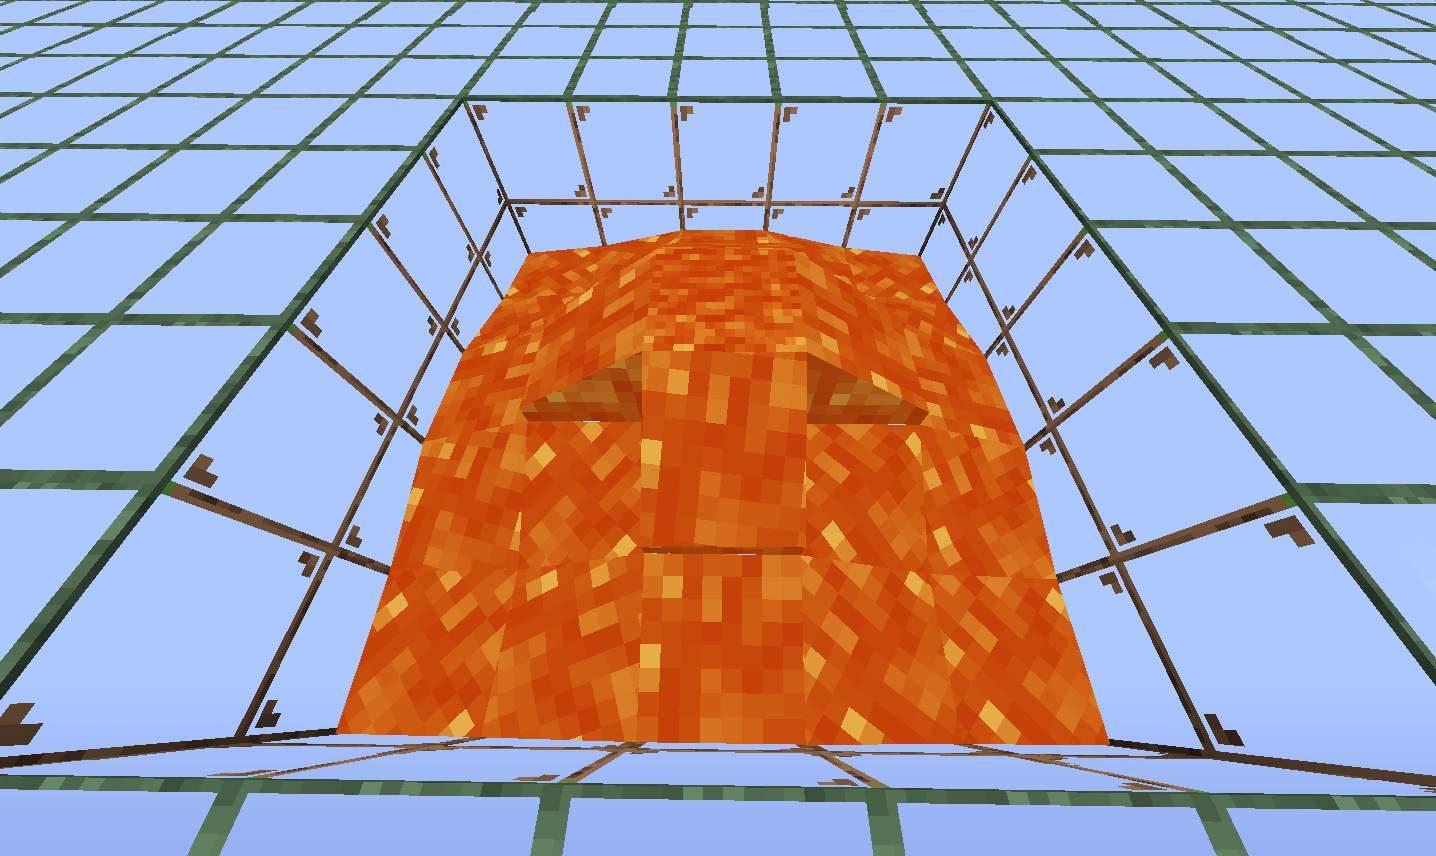 ban-xray-texture-minecraft-002